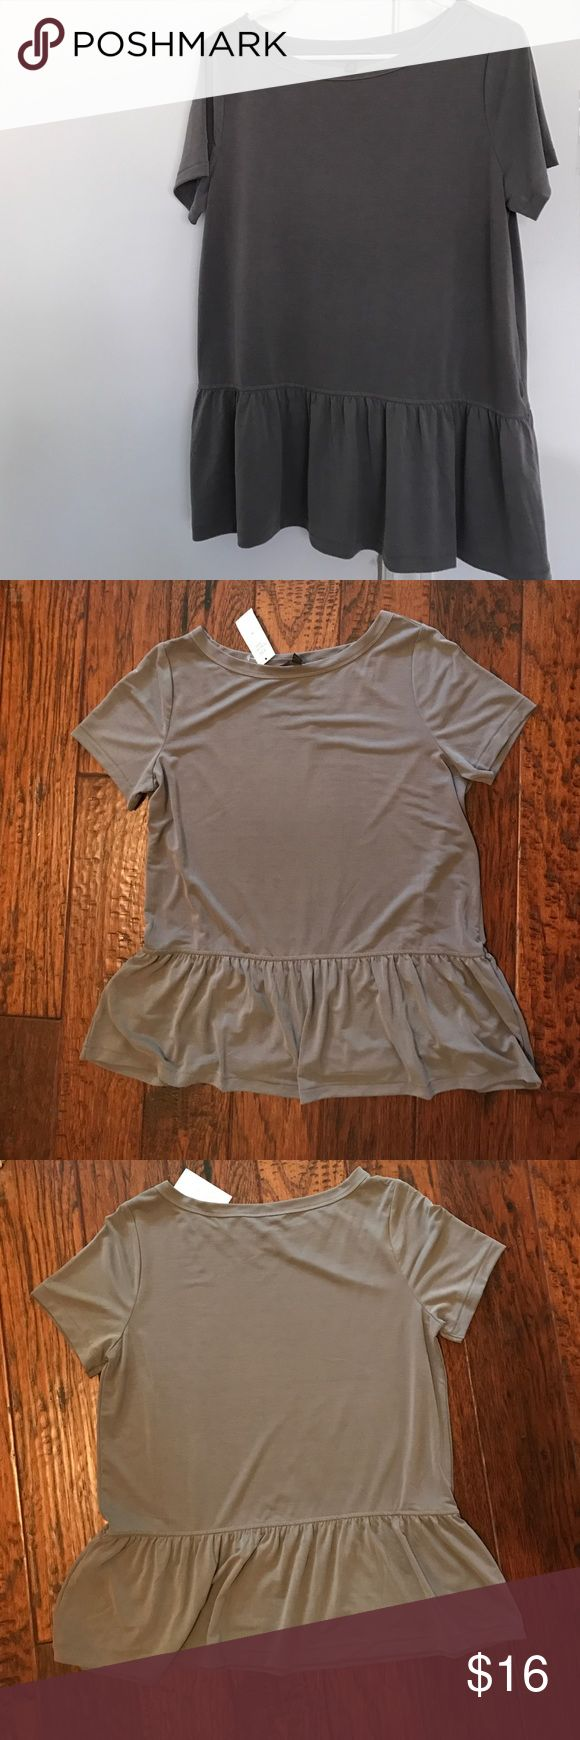 Banana Republic gray peplum shirt New, never worn peplum top. This shirt is a slightly heavier weight compared to a regular tshirt. 78% modal 22% polyester Banana Republic Tops Tees - Short Sleeve